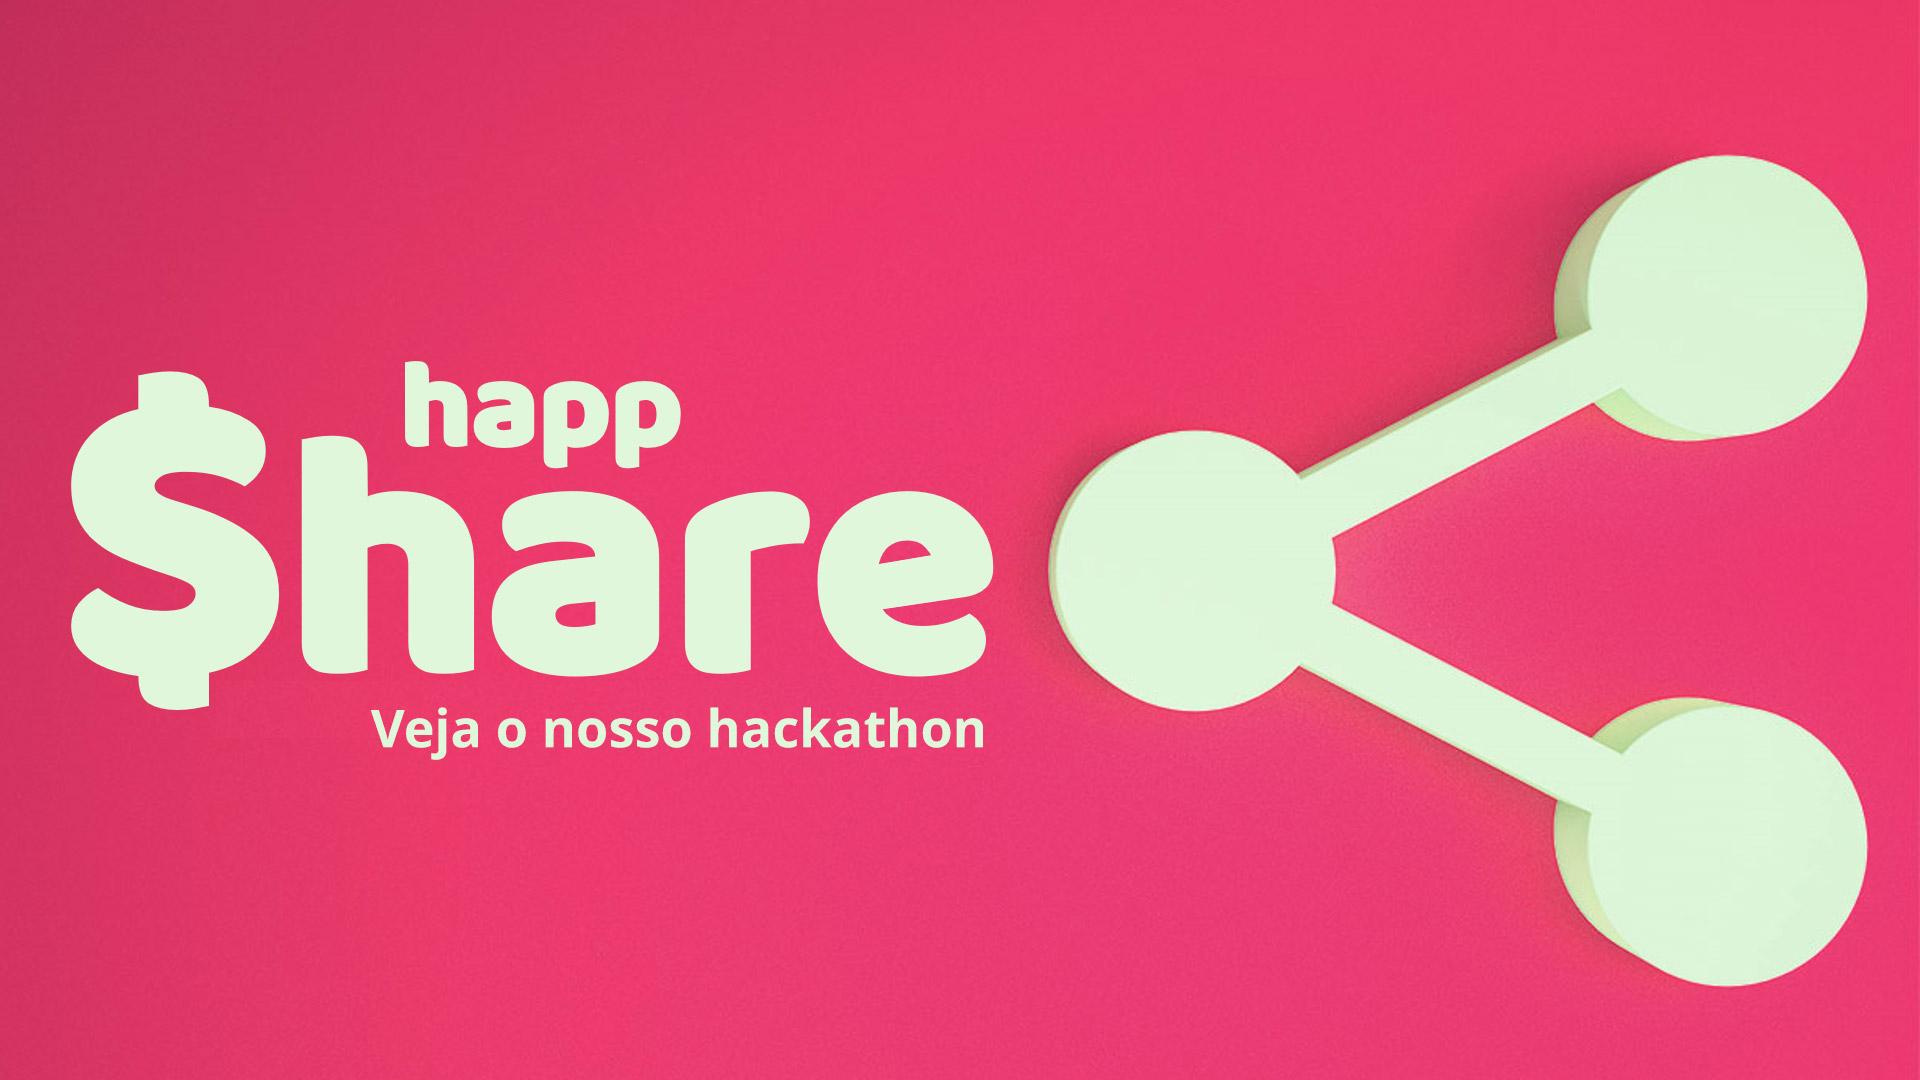 Happshare - o primeiro Hackathon da Happmobi